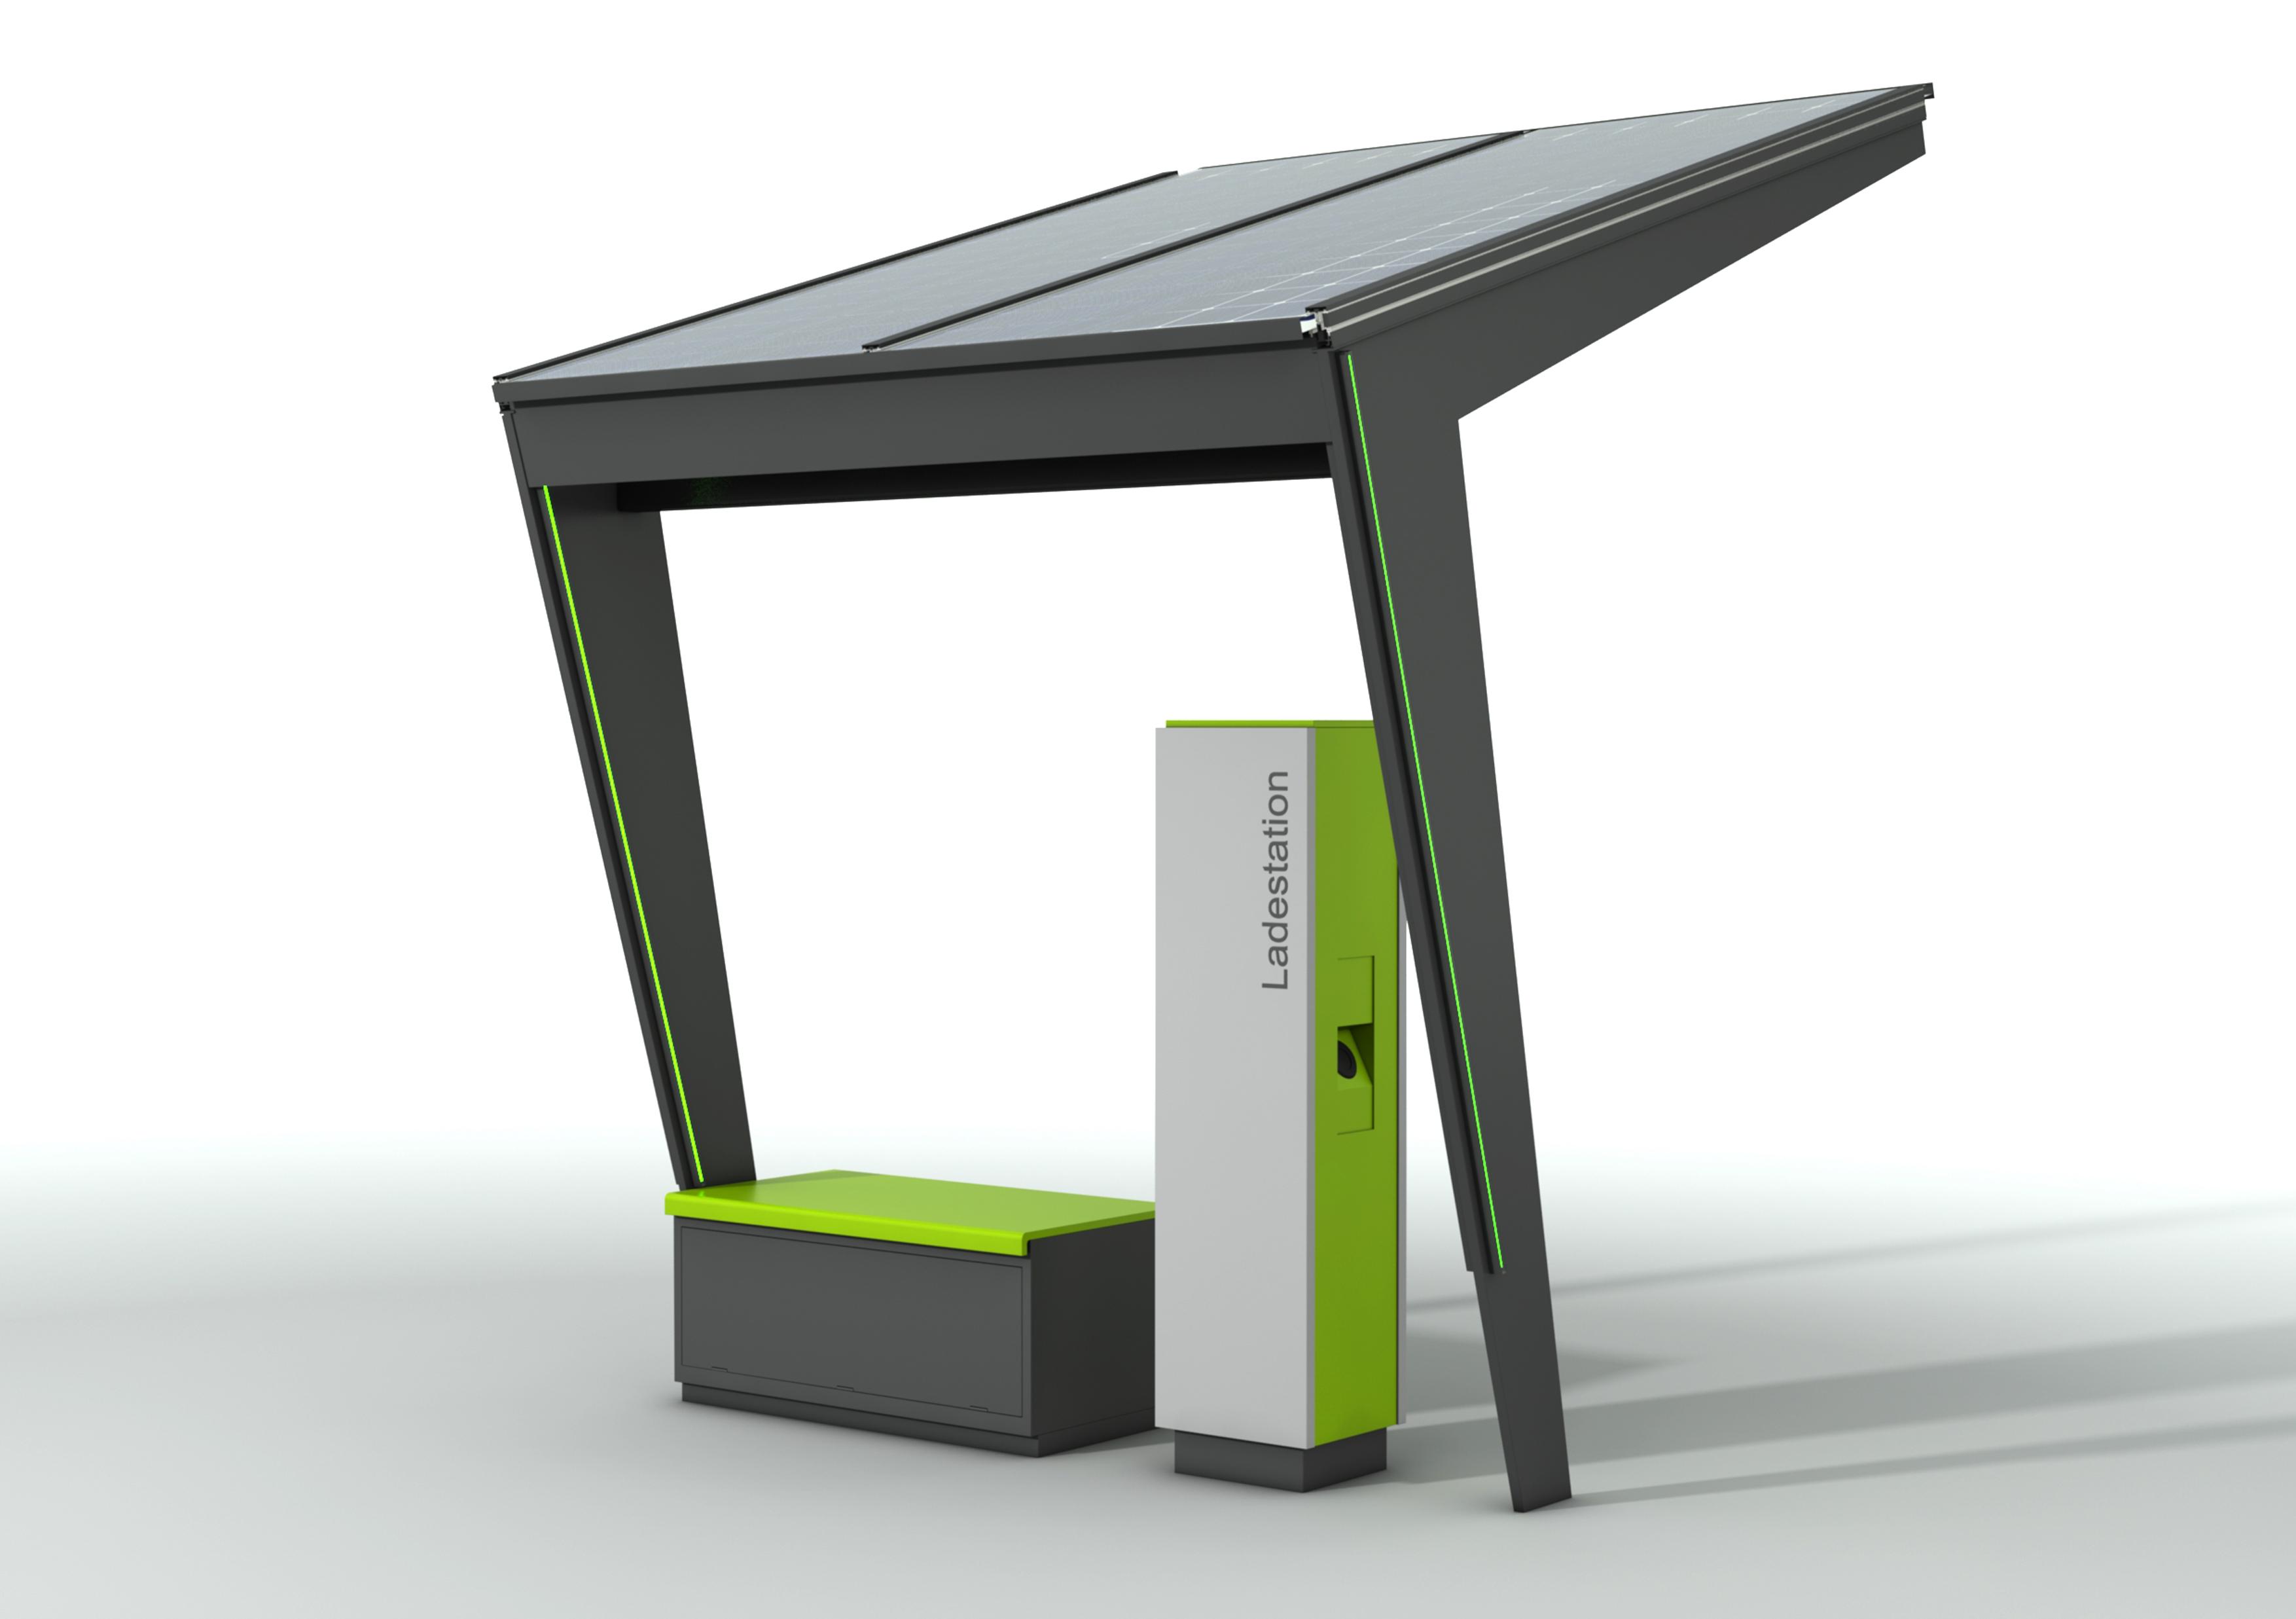 einzelsegment elektroauto ladestation berdachung. Black Bedroom Furniture Sets. Home Design Ideas